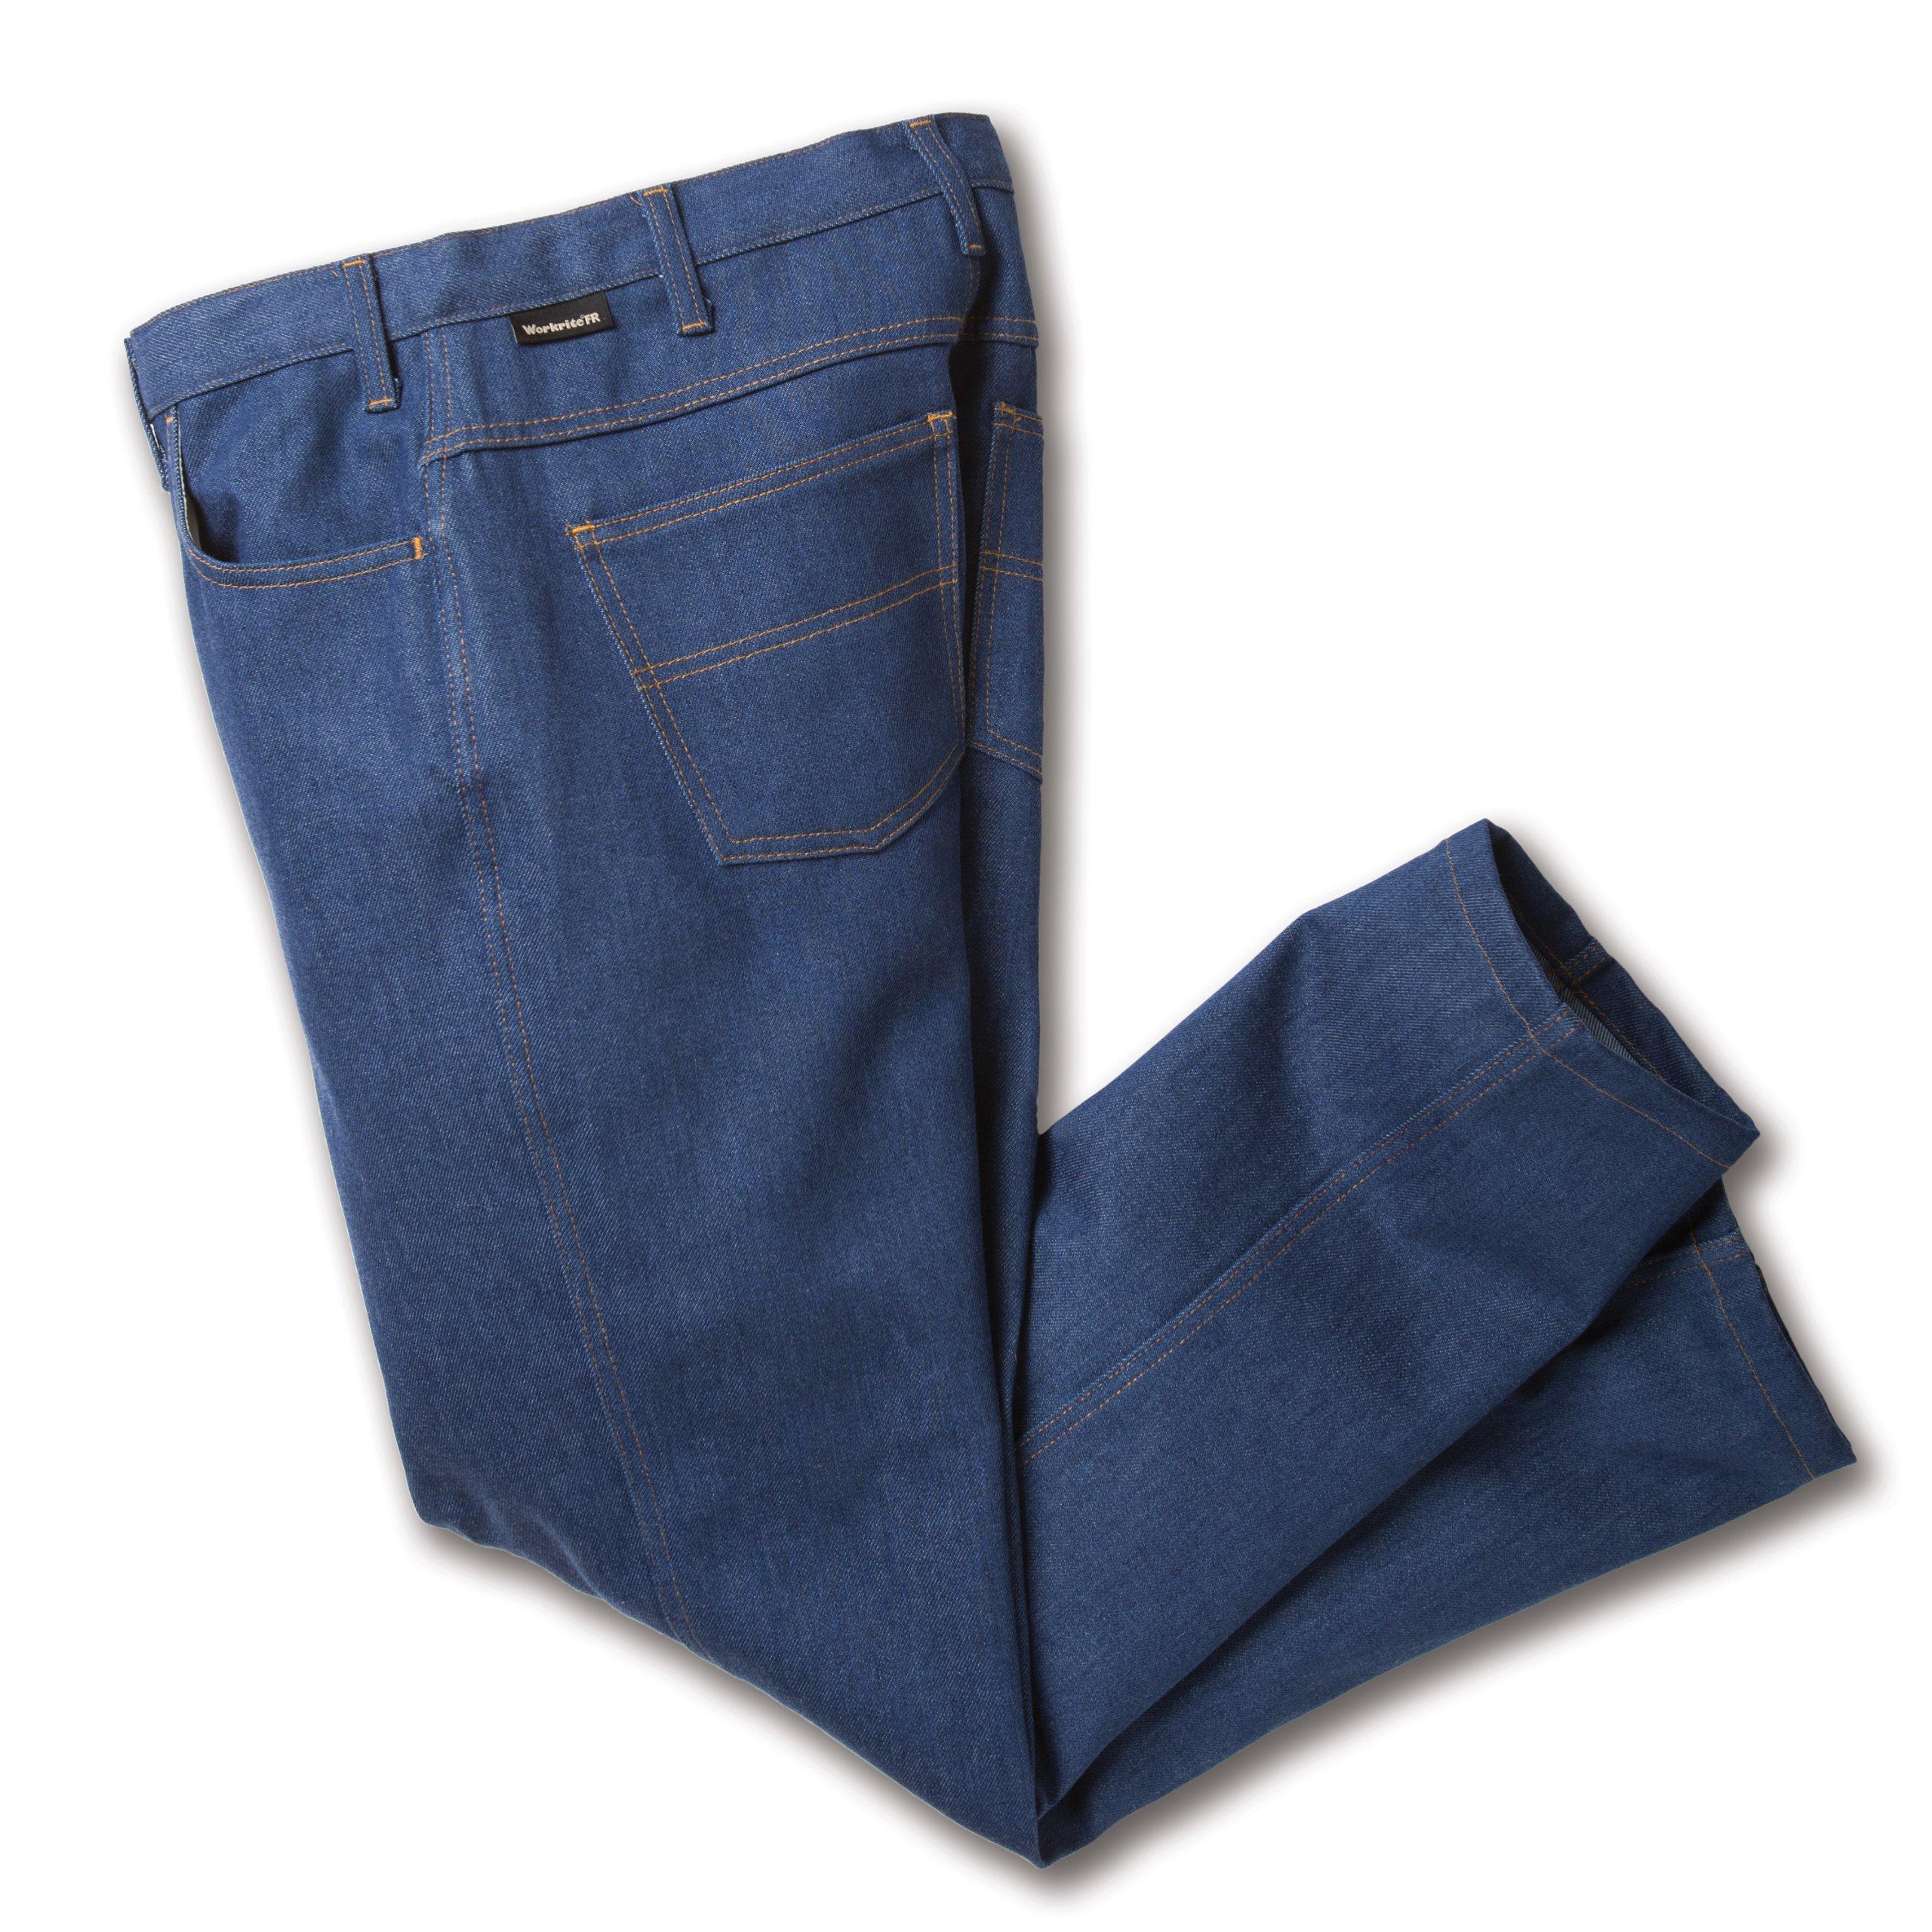 Workrite 418ID14DN48-36 Flame Resistant 14 oz Indura Jean-Cut Pant, 48 Waist Size, 36 Inseam, Denim